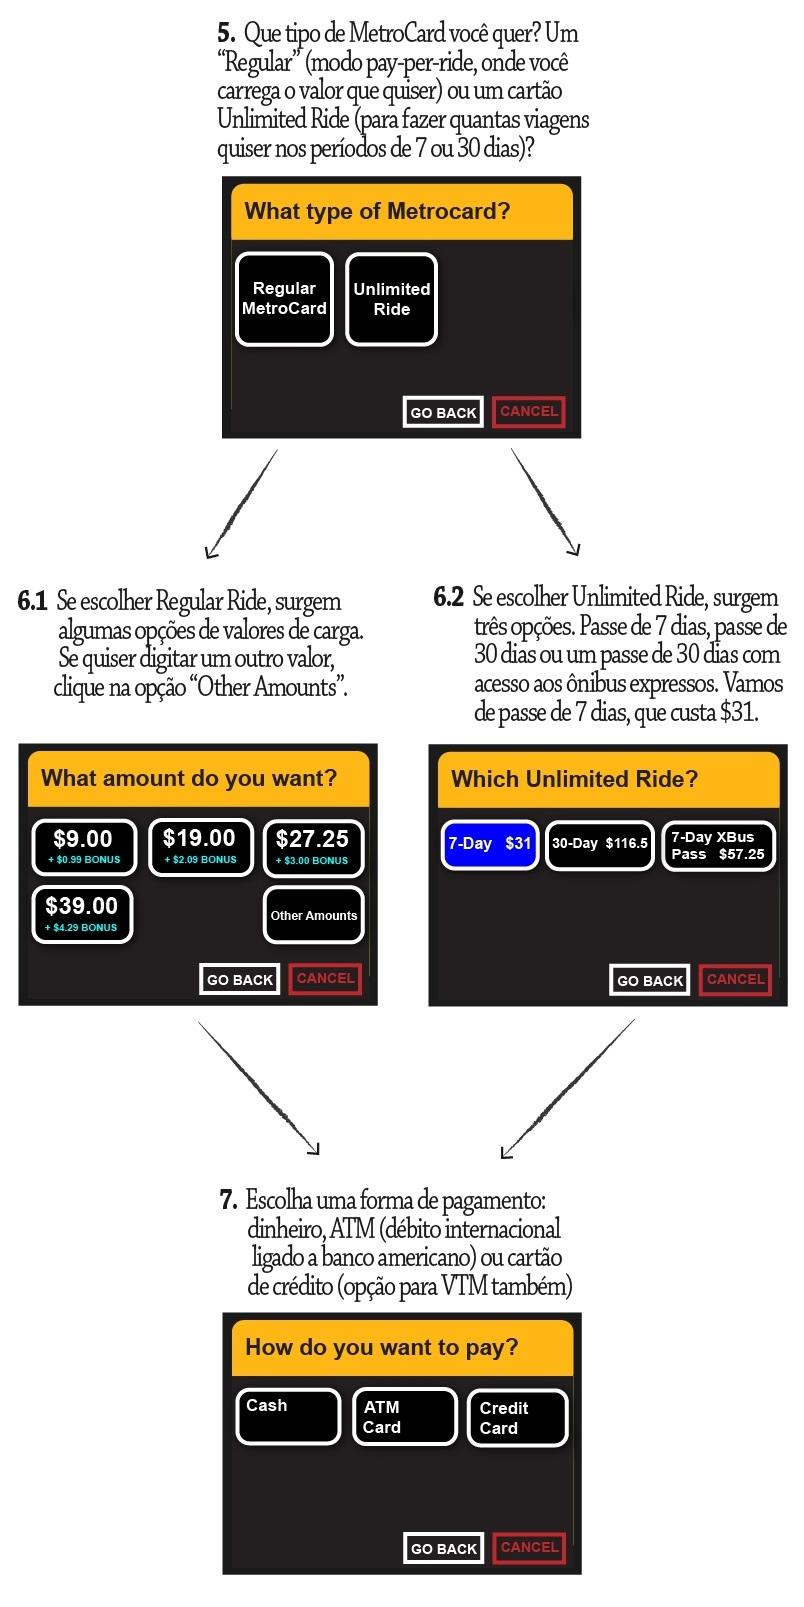 Onde comprar metrocard maquina passo a passo 8